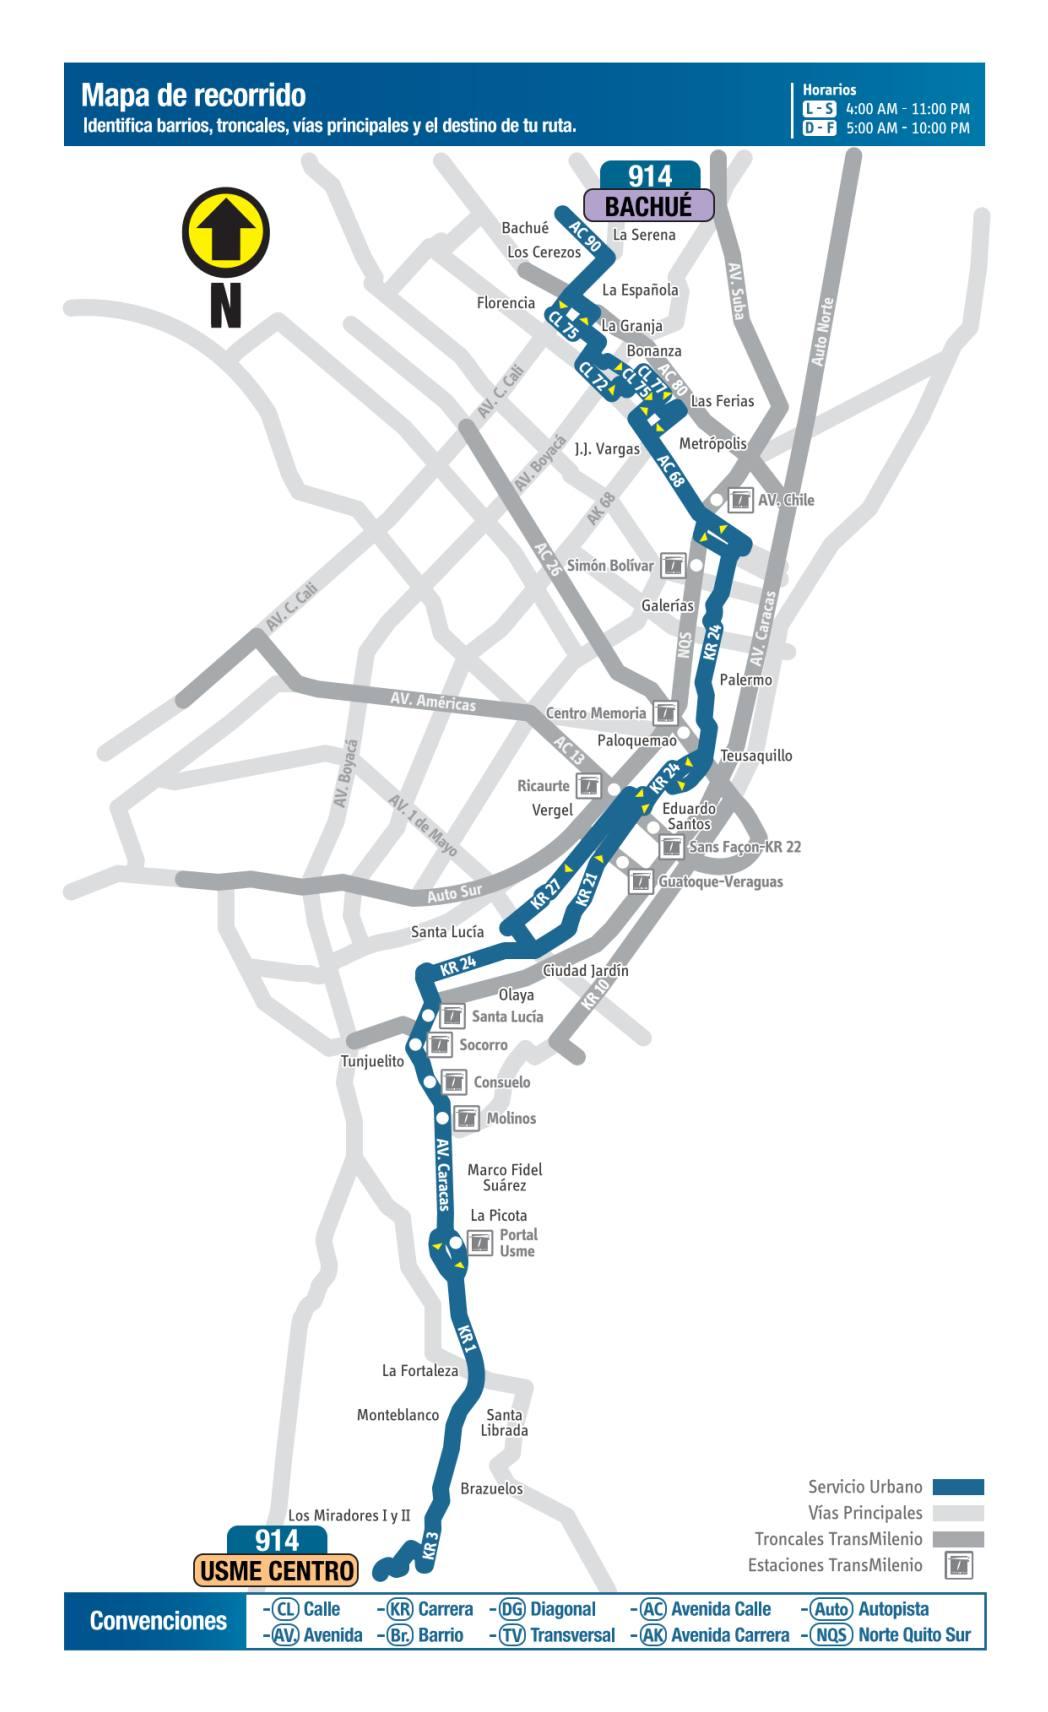 914 Bachué-Usme Centro, mapa bus urbano Bogotá